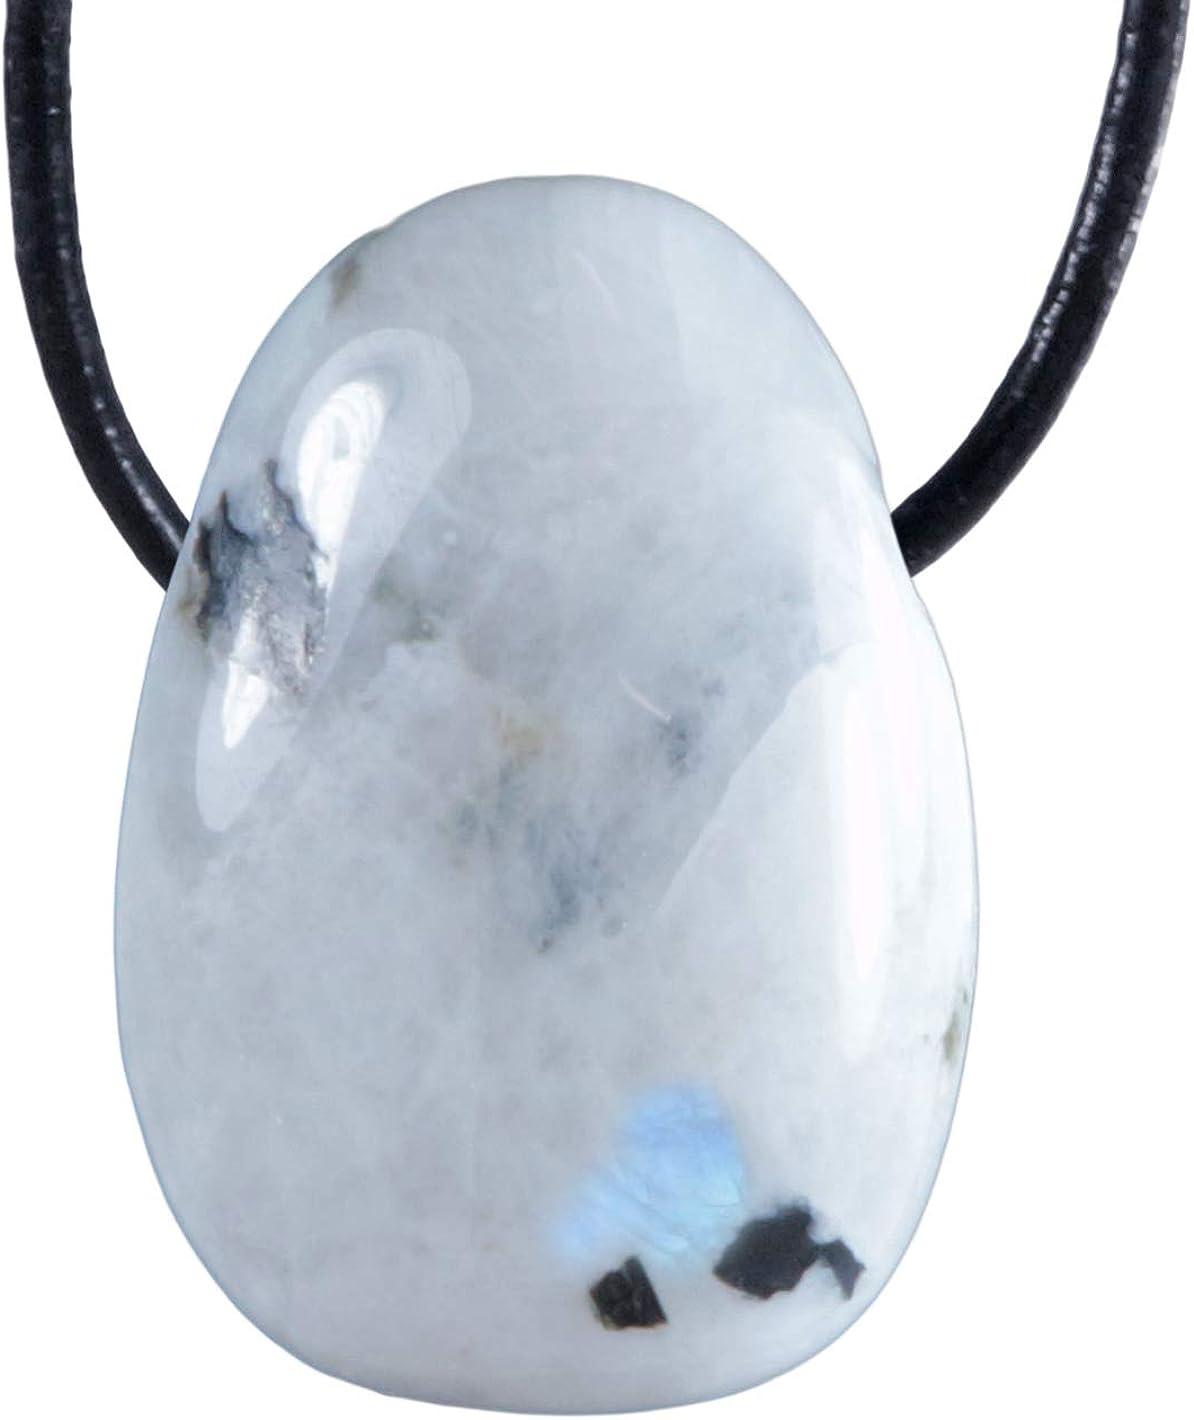 Lebensquelle Plus Arco Iris Piedra de Luna Gota Colgante Trommelstein Perforado con cordón de Cuero